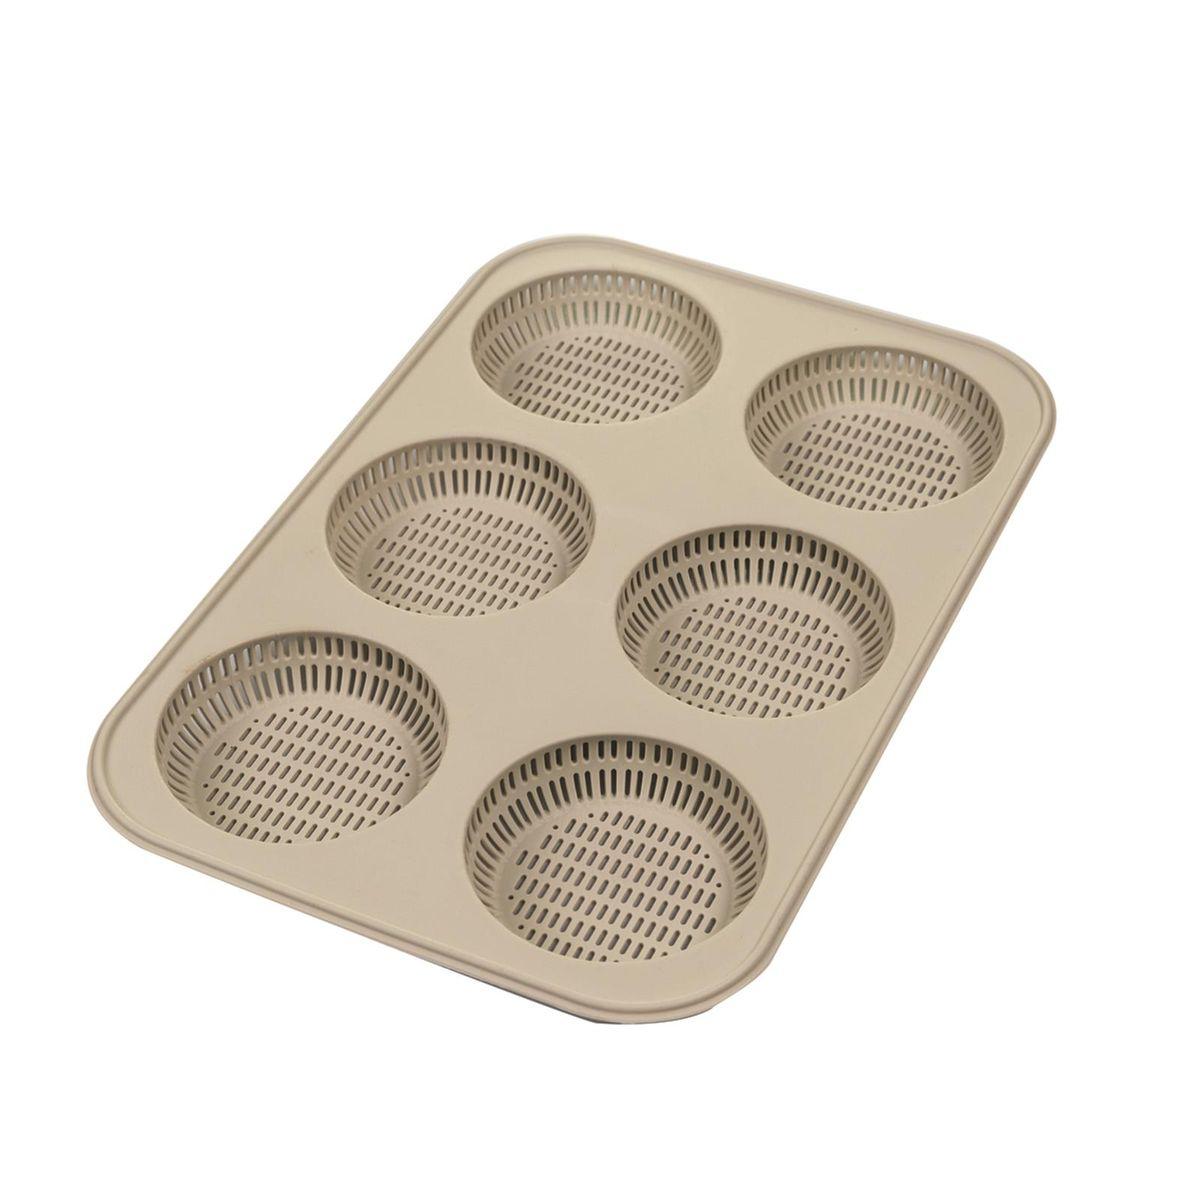 Moule mini-pains ronds burgers silicone perforé - Silikomart